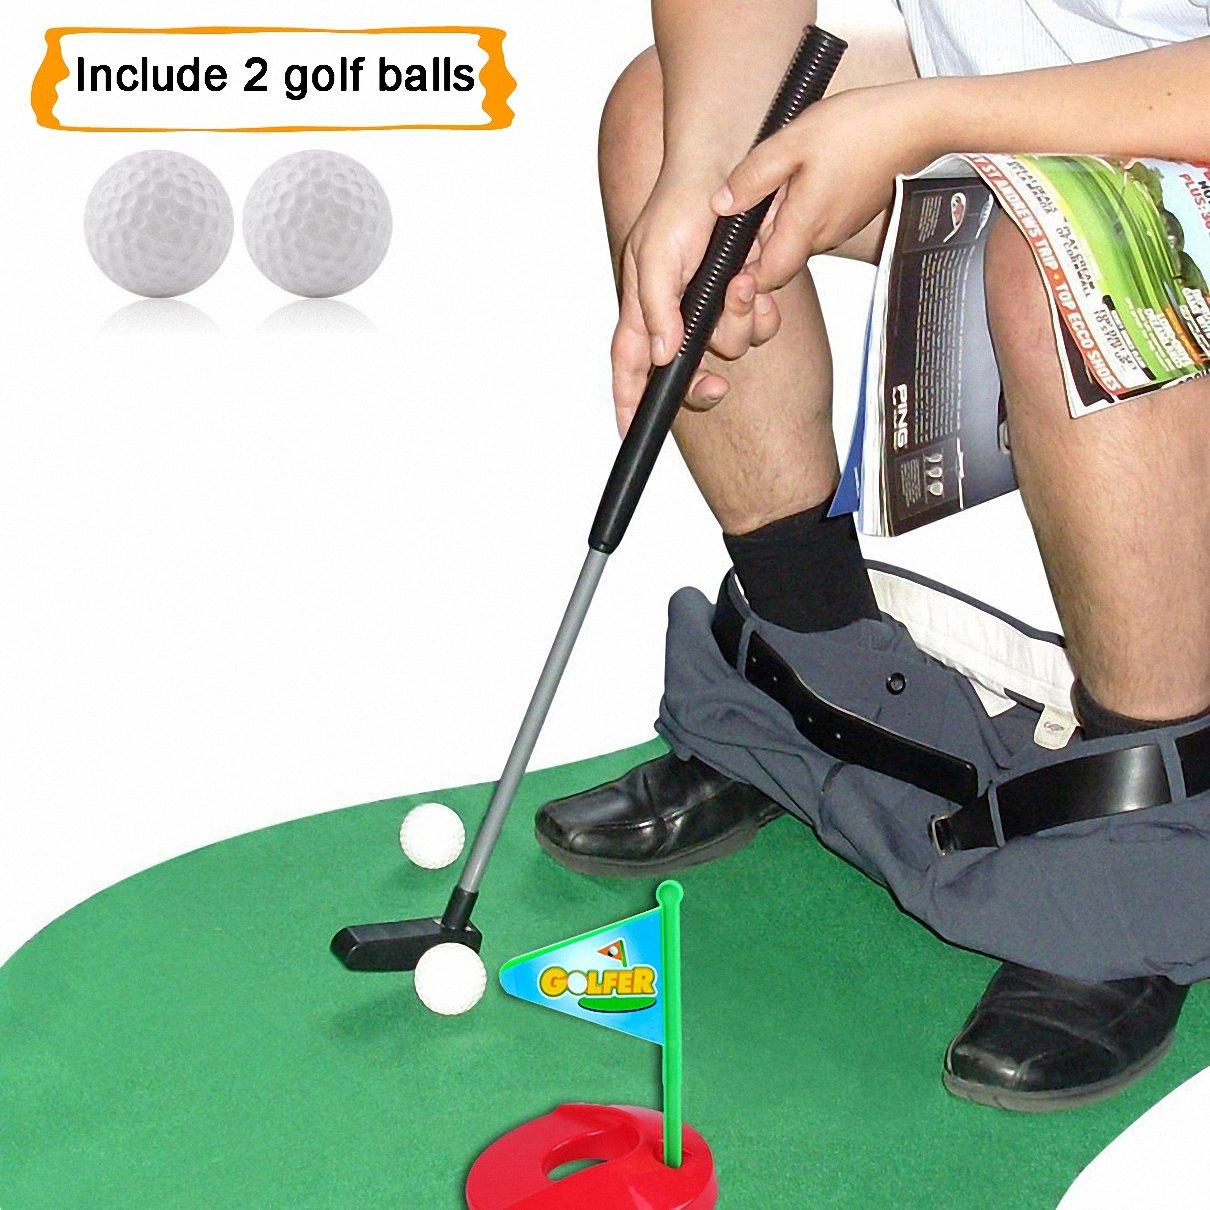 HighSound Toilet Golf, Potty Putter Set Bathroom Game Mini Golf Set Golf Putting Novelty Set, Play Golf on the Toilet